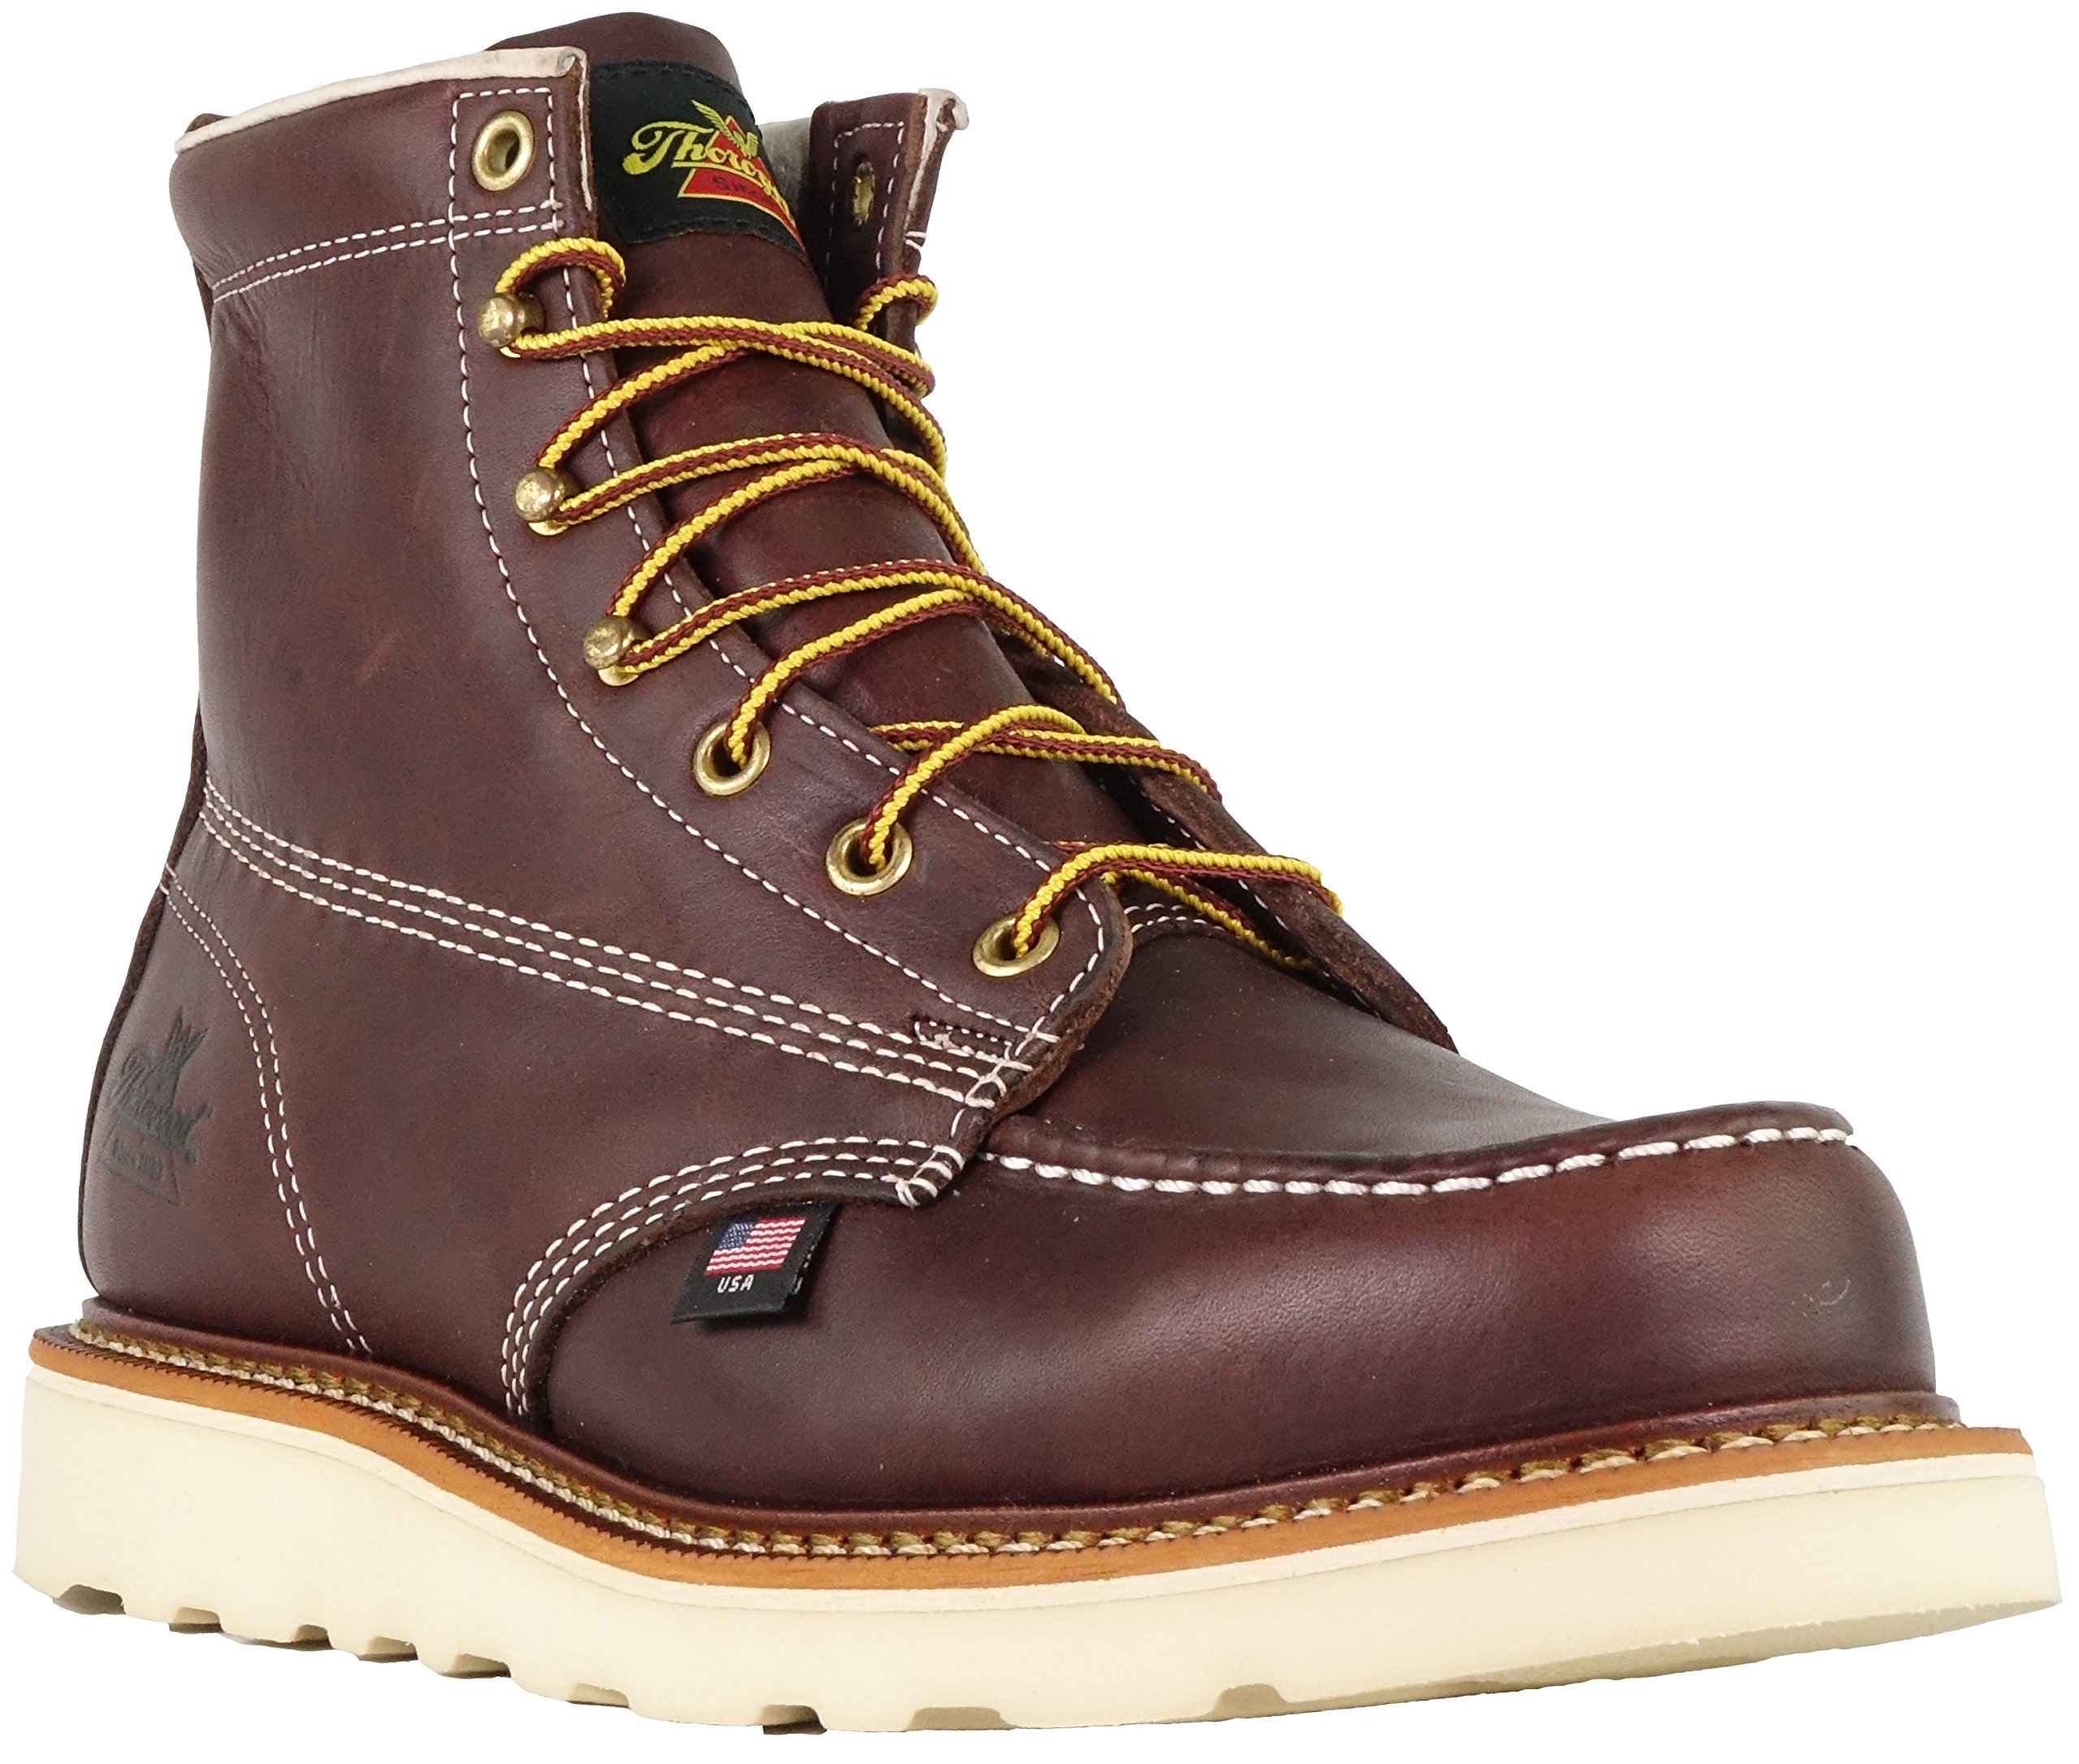 Thorogood 814-4216 Men's American Heritage 6'' Moc Toe Boot, Black Walnut - 12 2E US